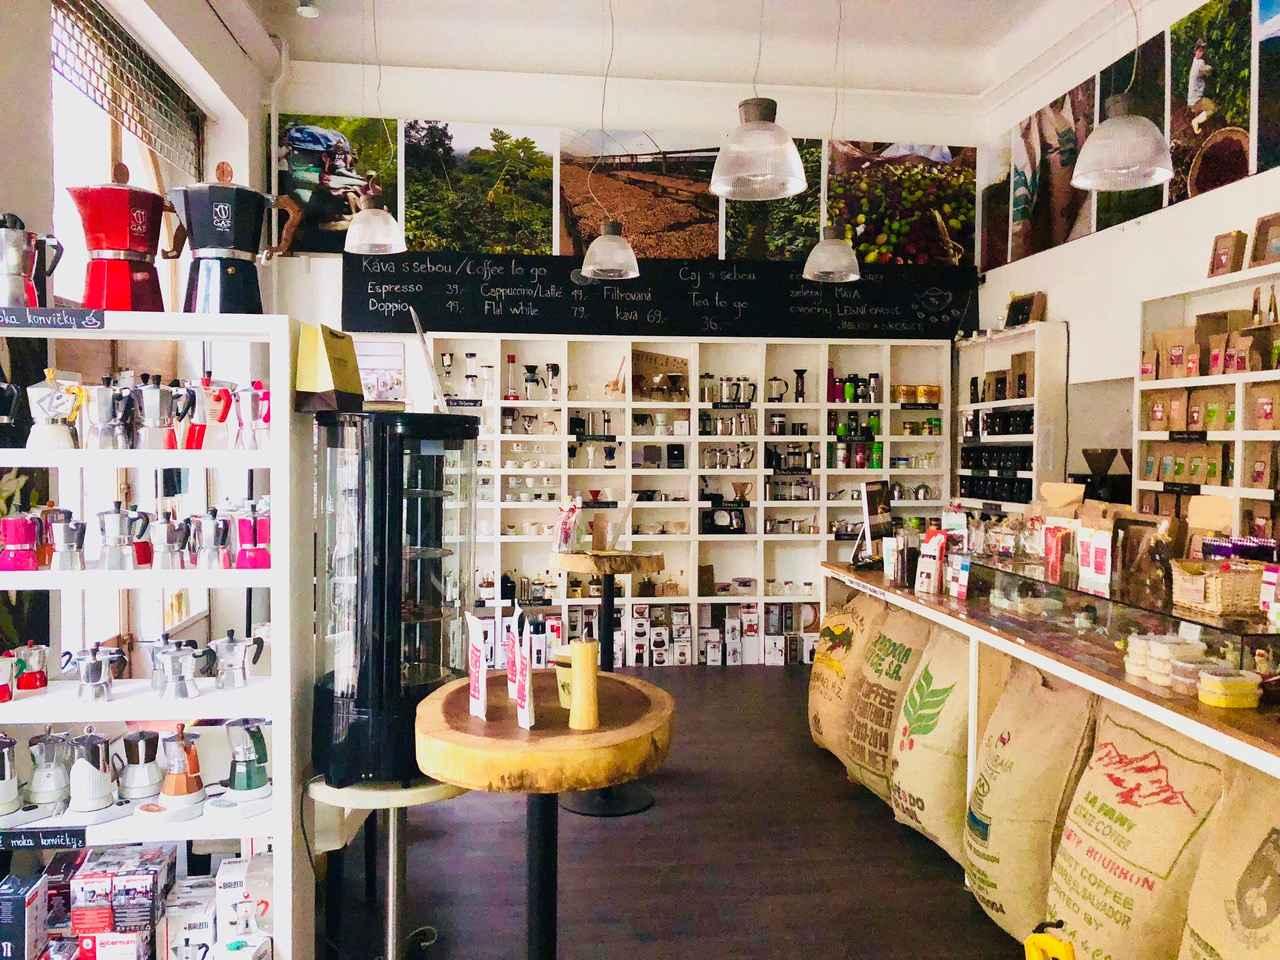 Kopi Luwak – coffee and tea shop